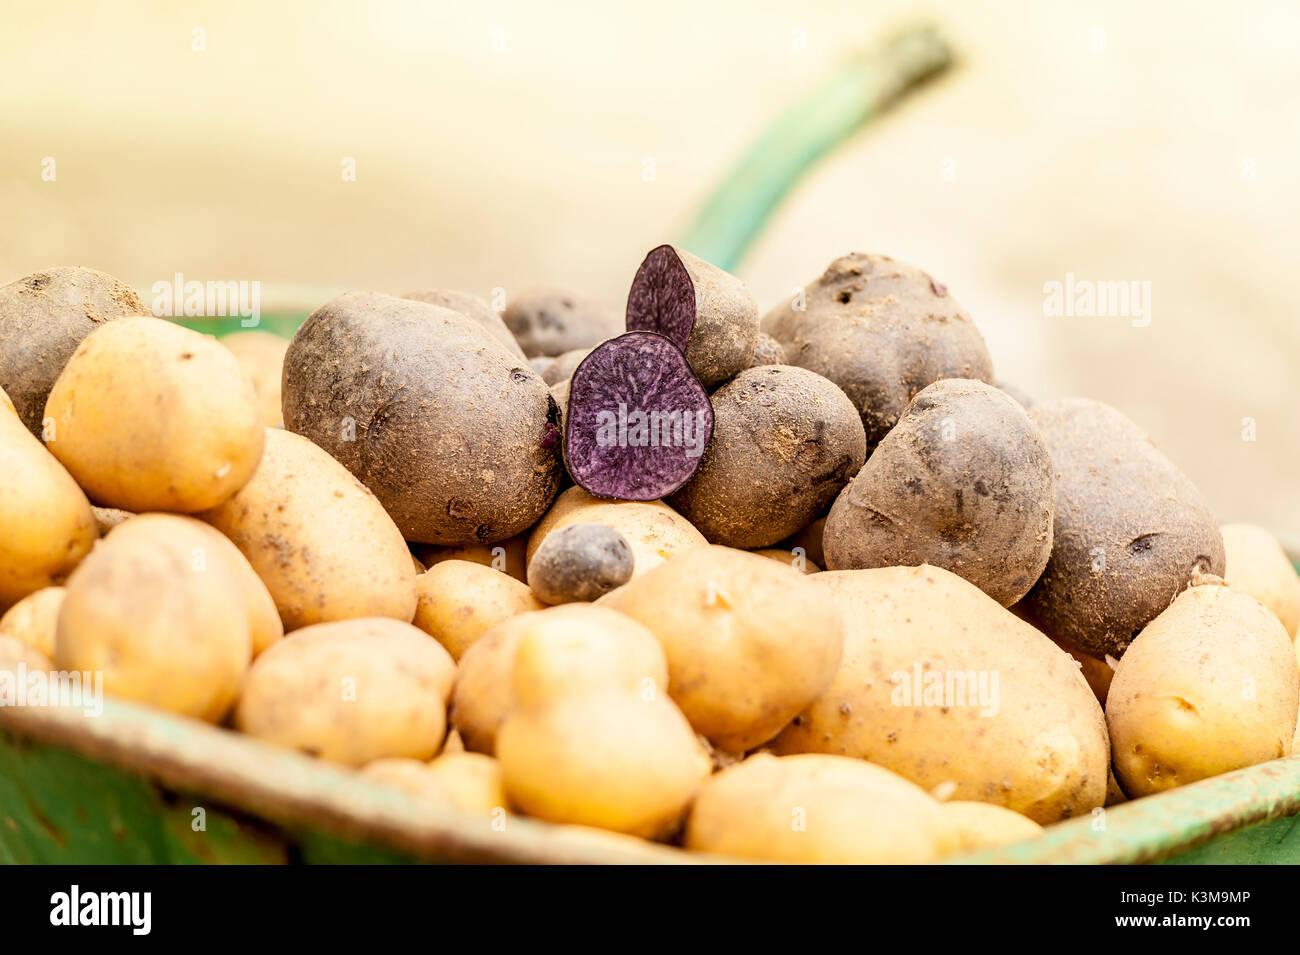 potato, vegetable, harvest, produce, farm - Stock Image